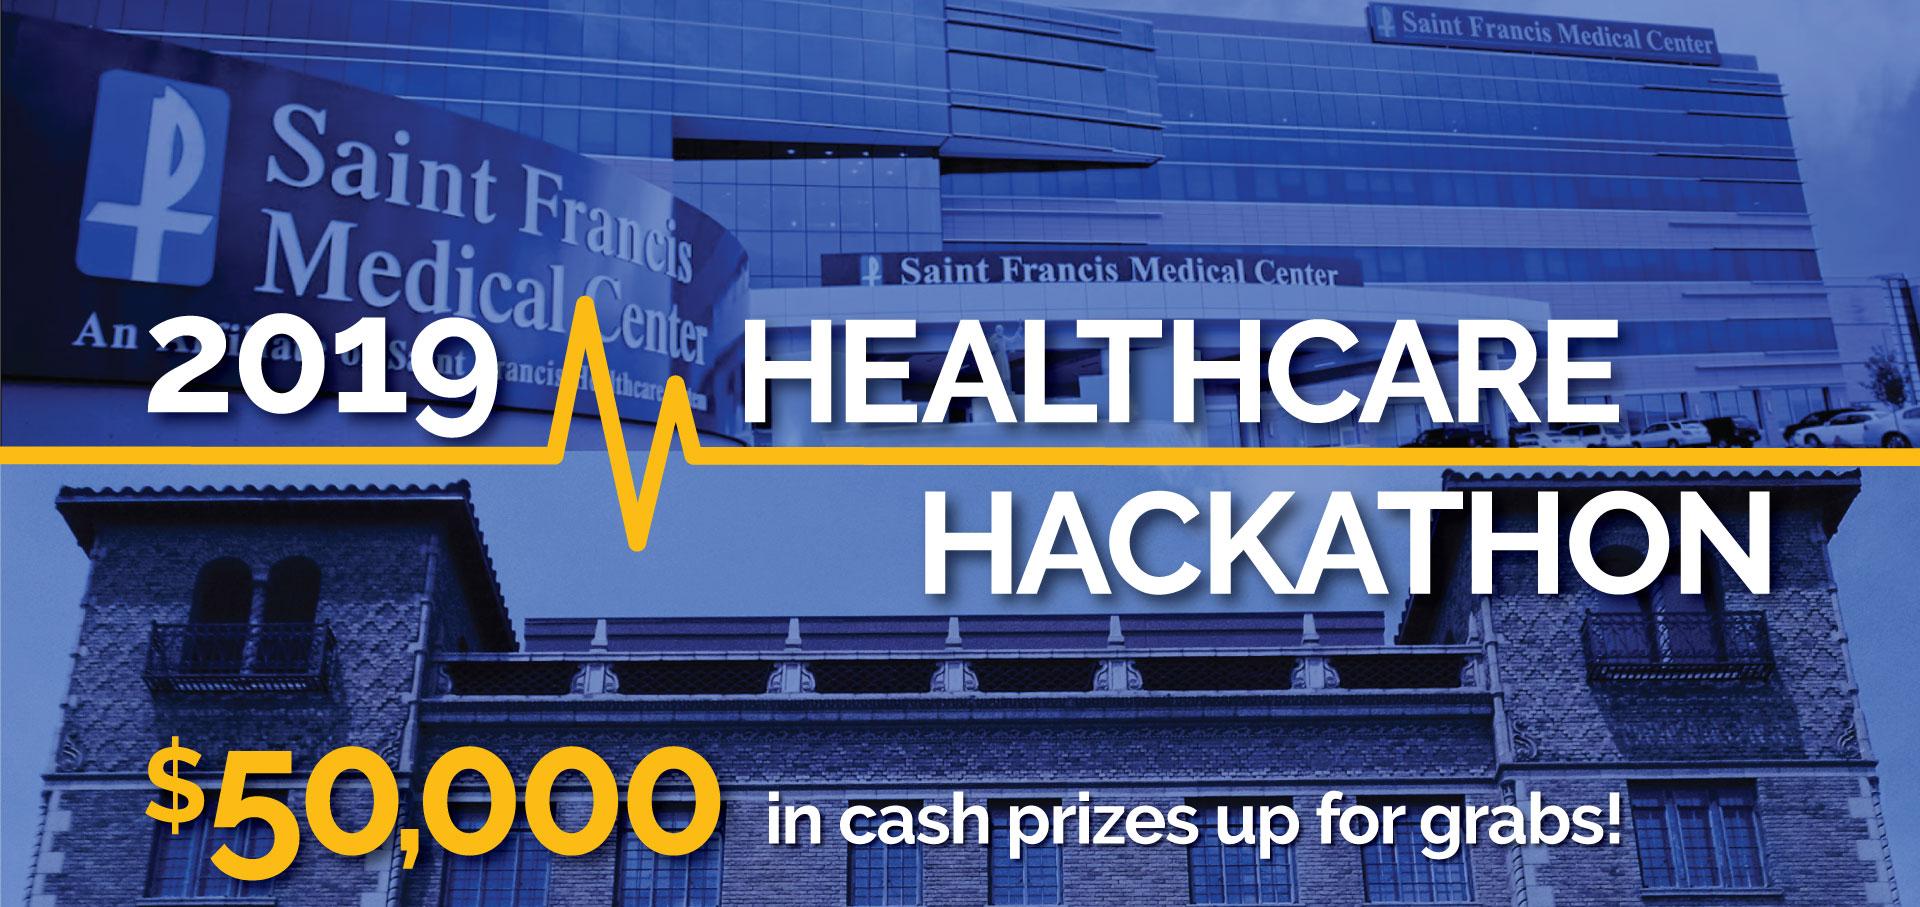 2019 Healthcare Hackathon - $50,000 in cash prizes up for grabs!